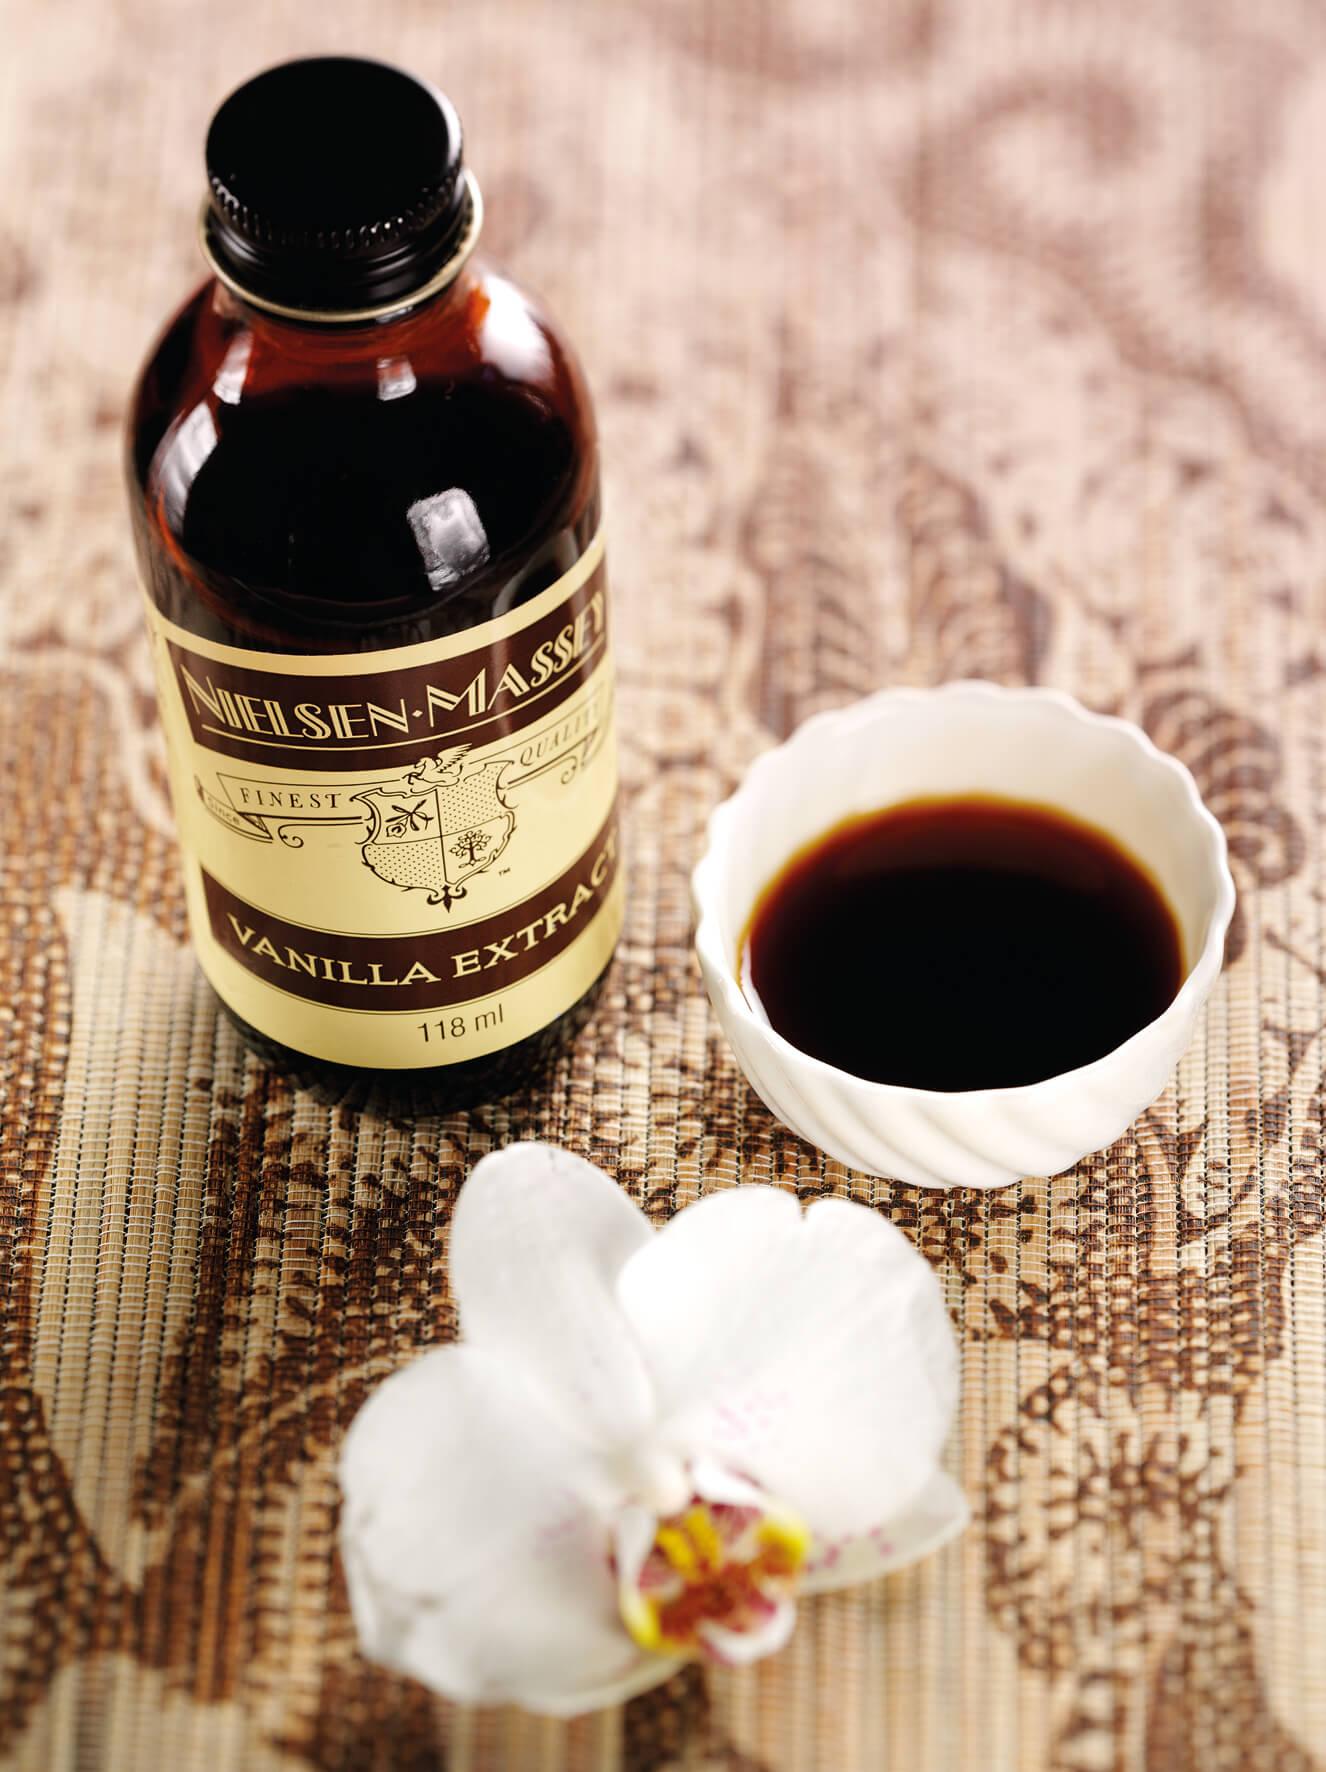 Nielsen-Massey Vanilla Extract Lifestyle Image